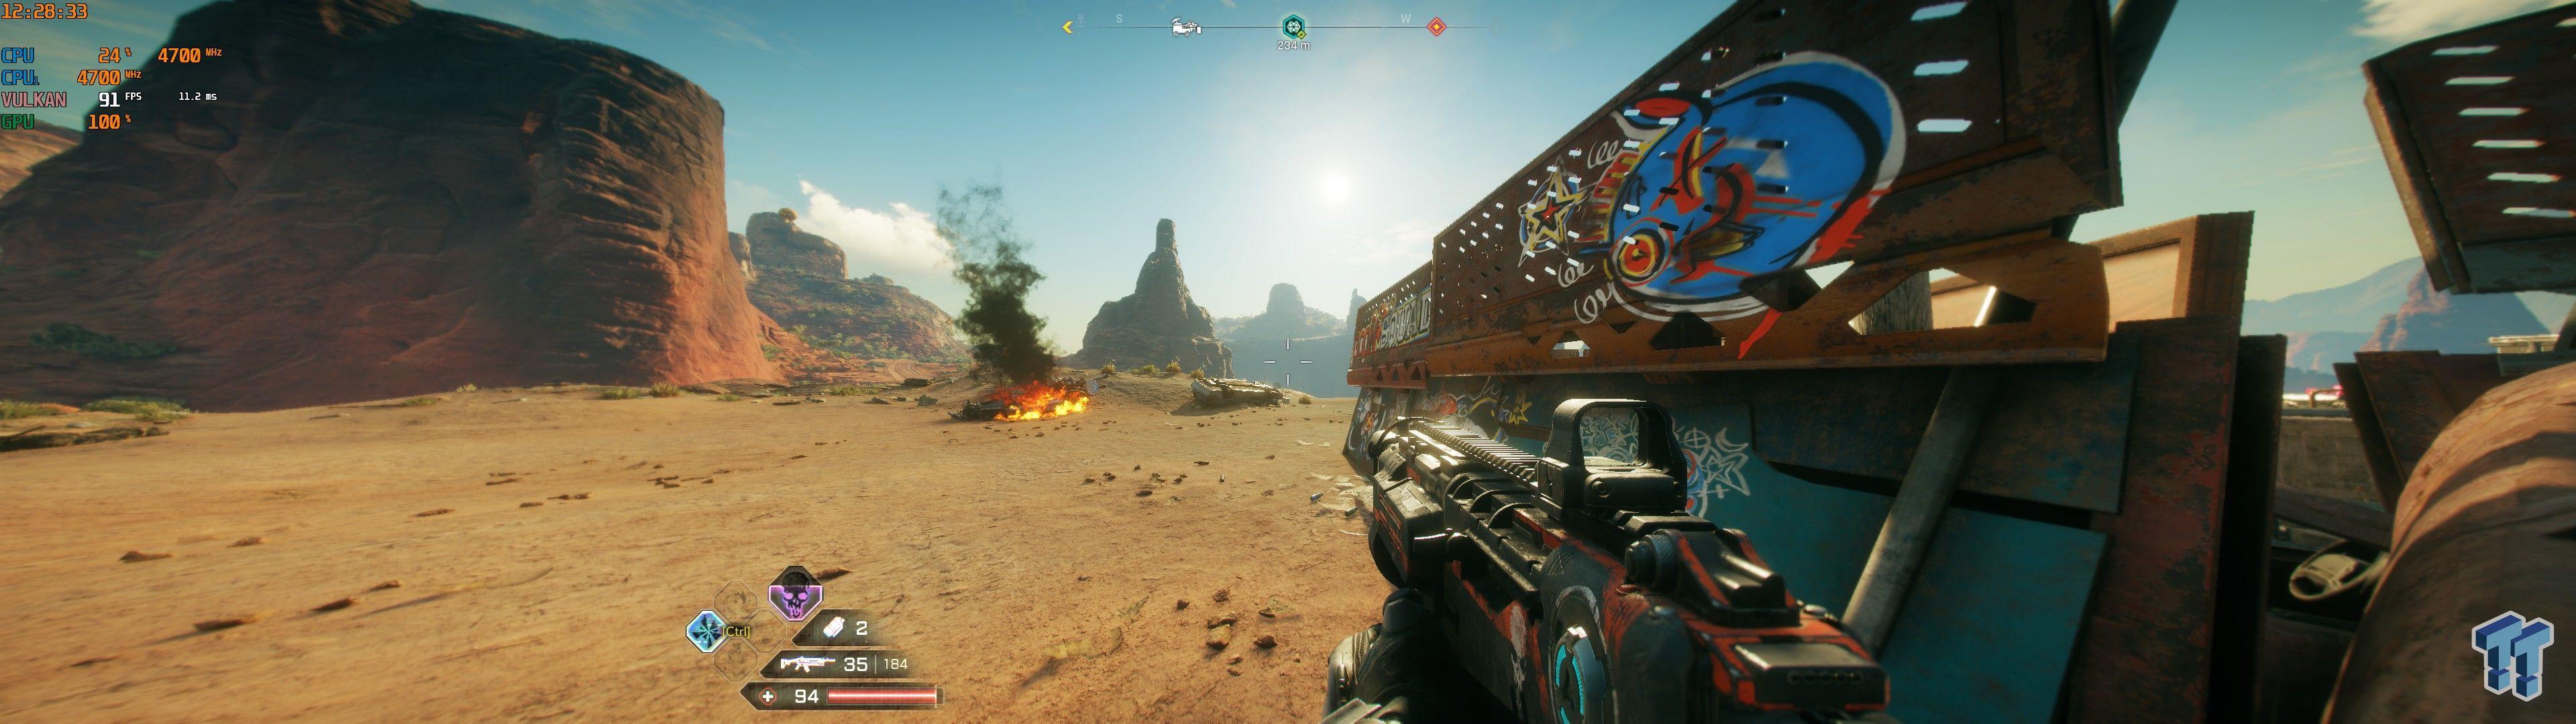 ASUS ROG Strix XG49VQ Review: 32:9 Gaming Goodness At 144Hz